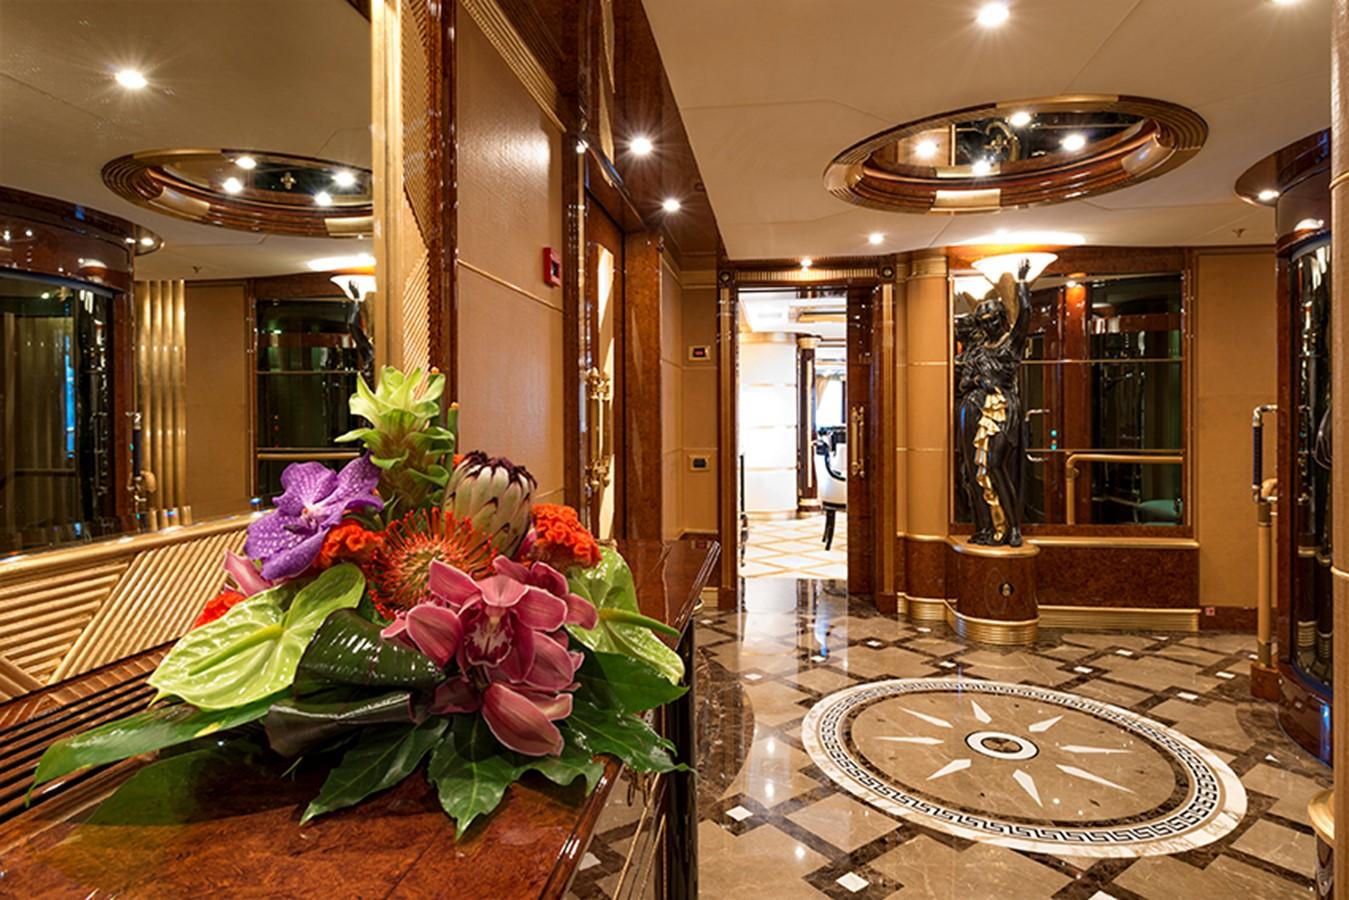 Foyer - 203 BENETTI For Sale